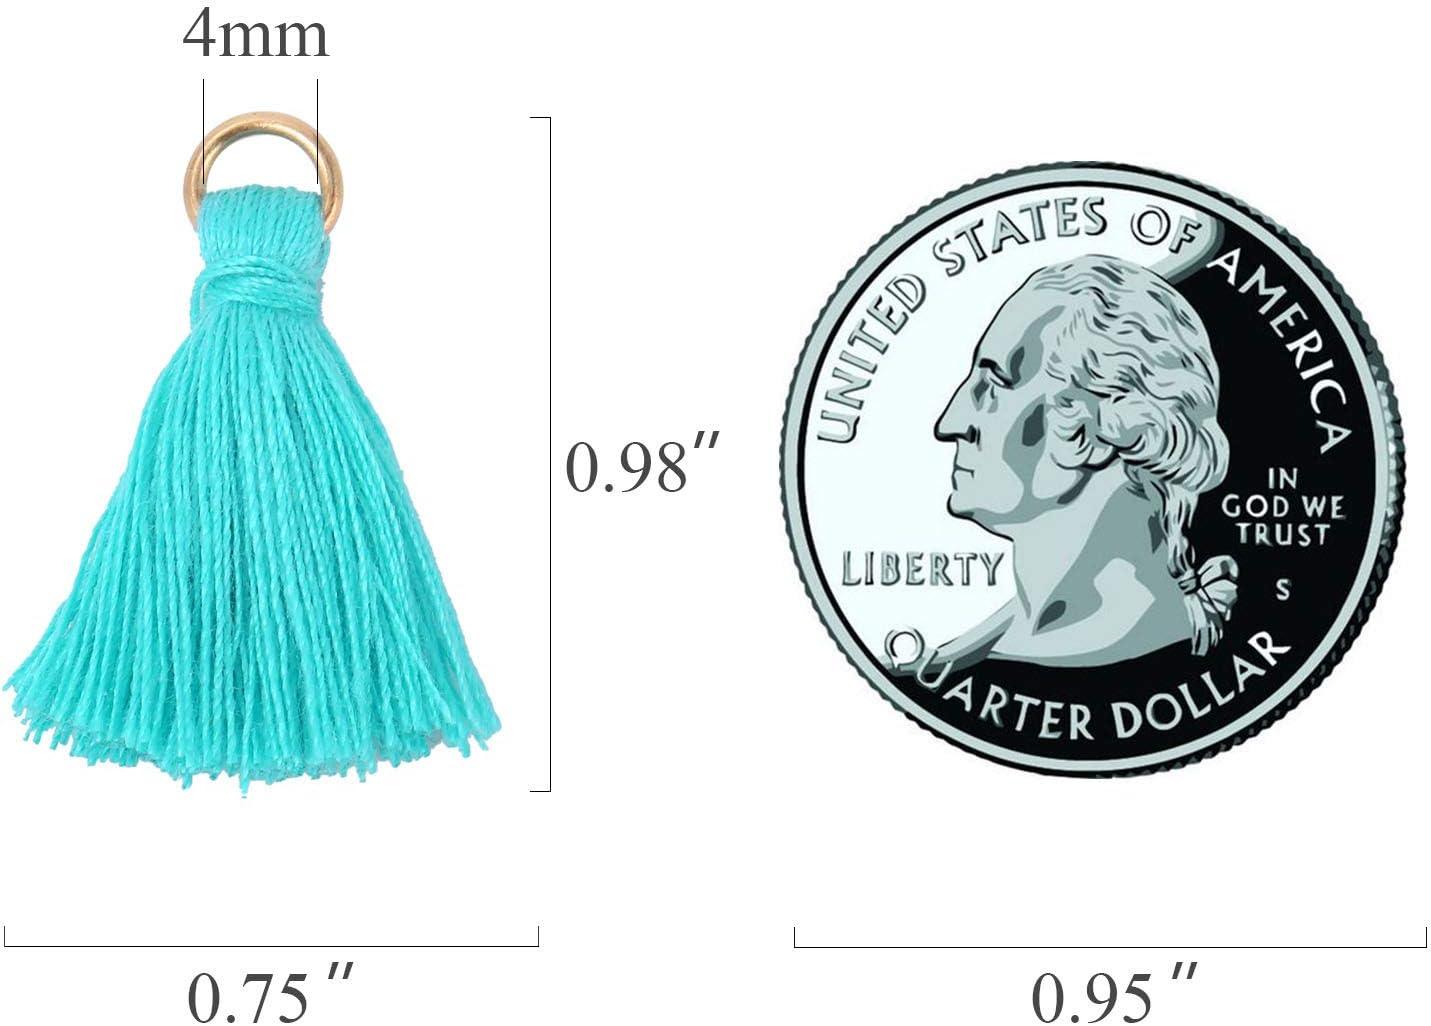 Wholesale Mini Tassel Charms Tiny Short Cotton Thread Tassels Bulk for Crafts and Jewelry Making 95-100PCS